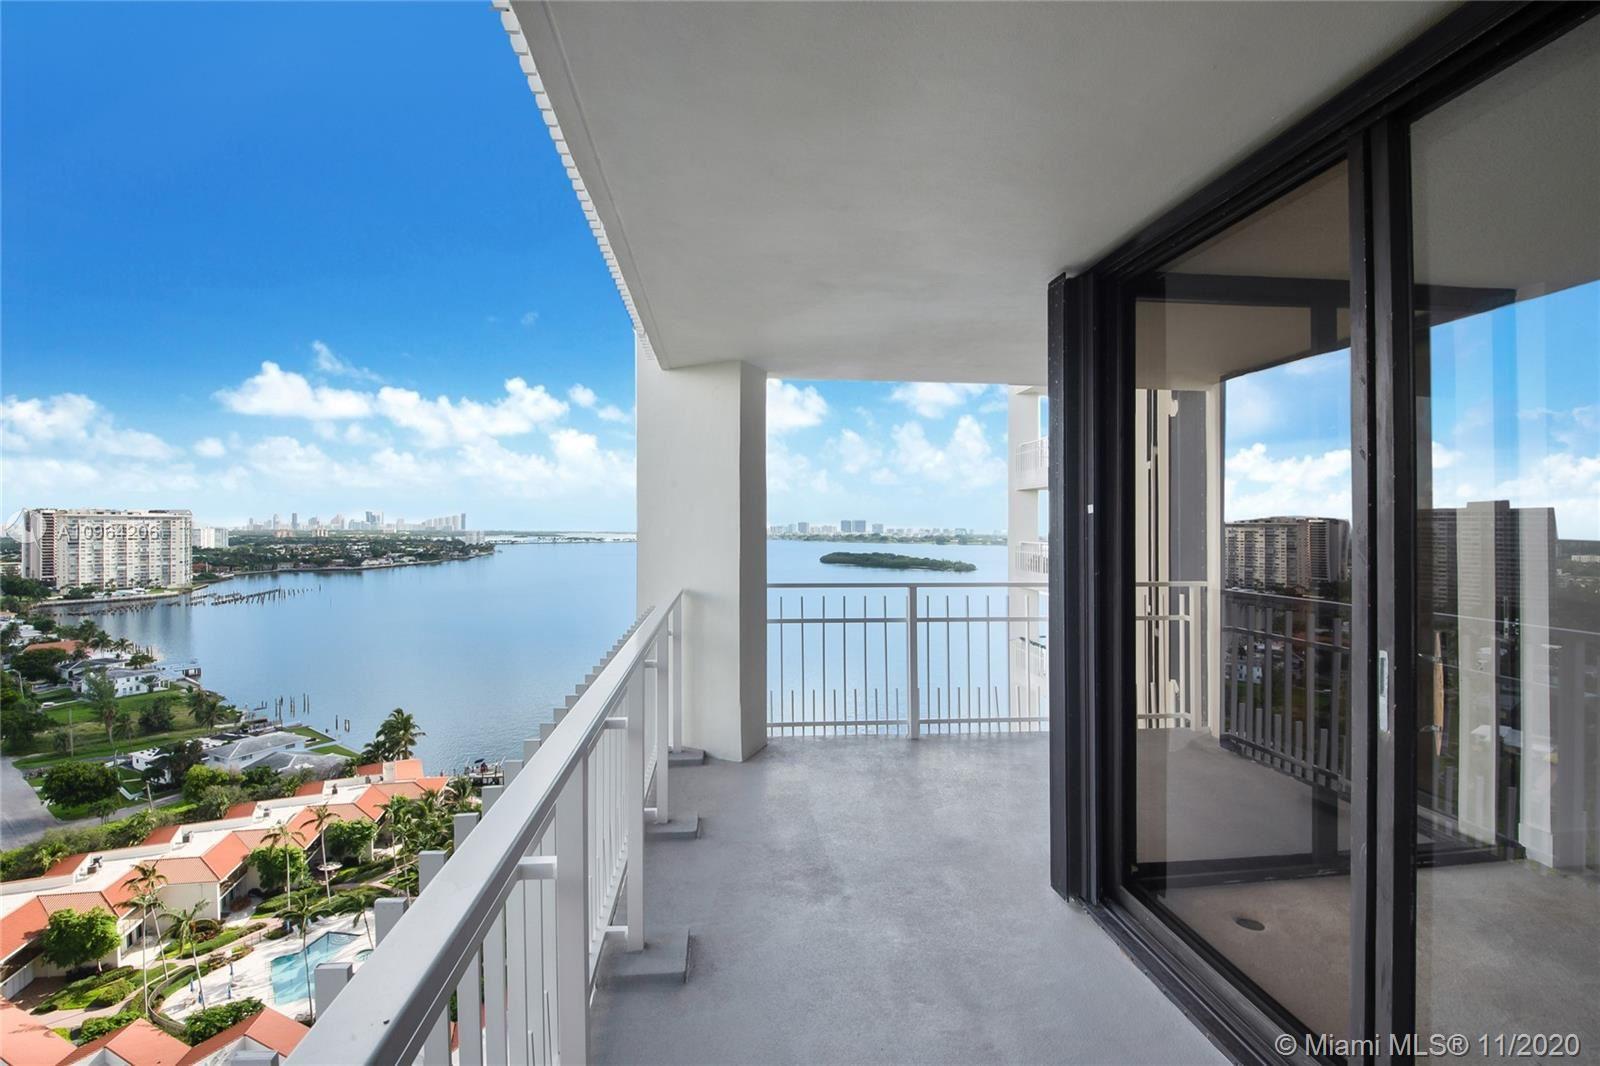 4000 Towerside Ter #2003, Miami, FL 33138 - #: A10964206